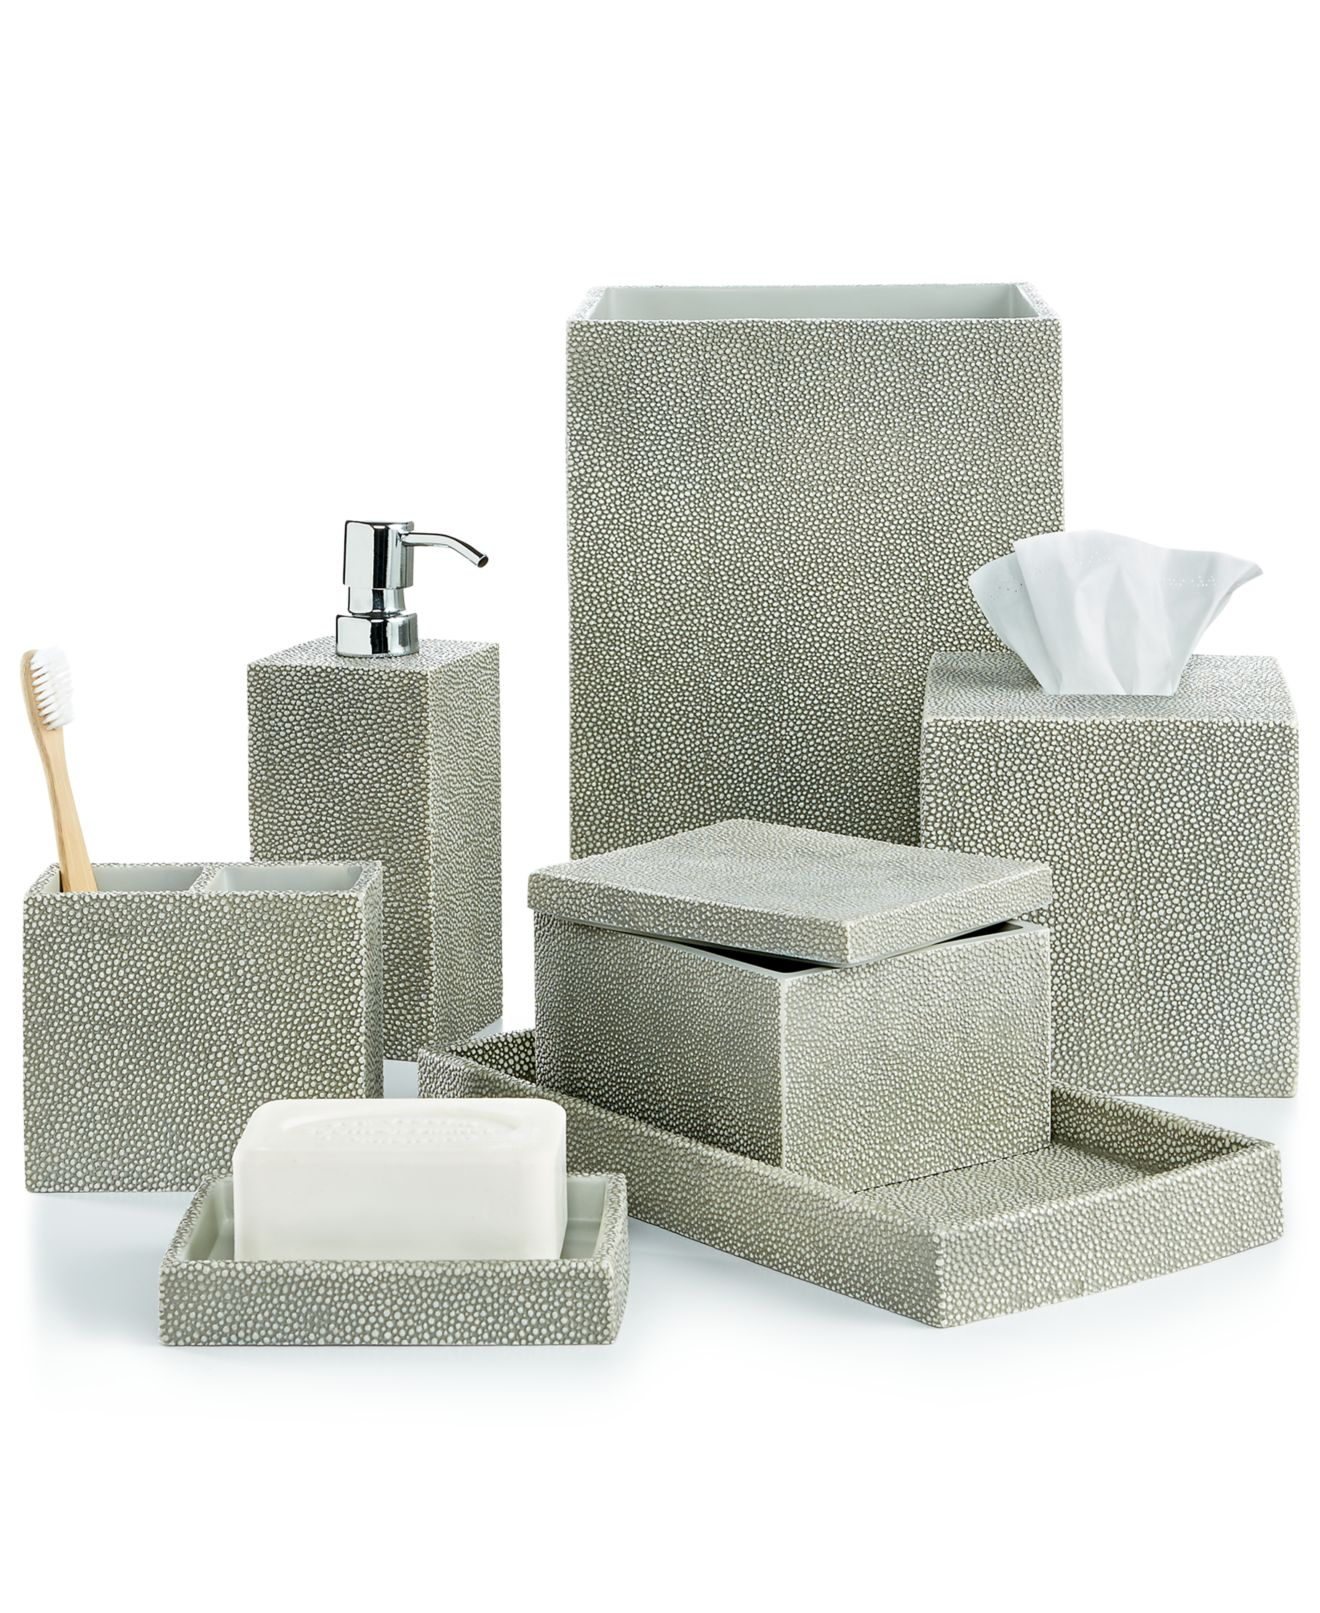 Bathroom Accessories West Elm traditional bathroom accessories uk : brightpulse